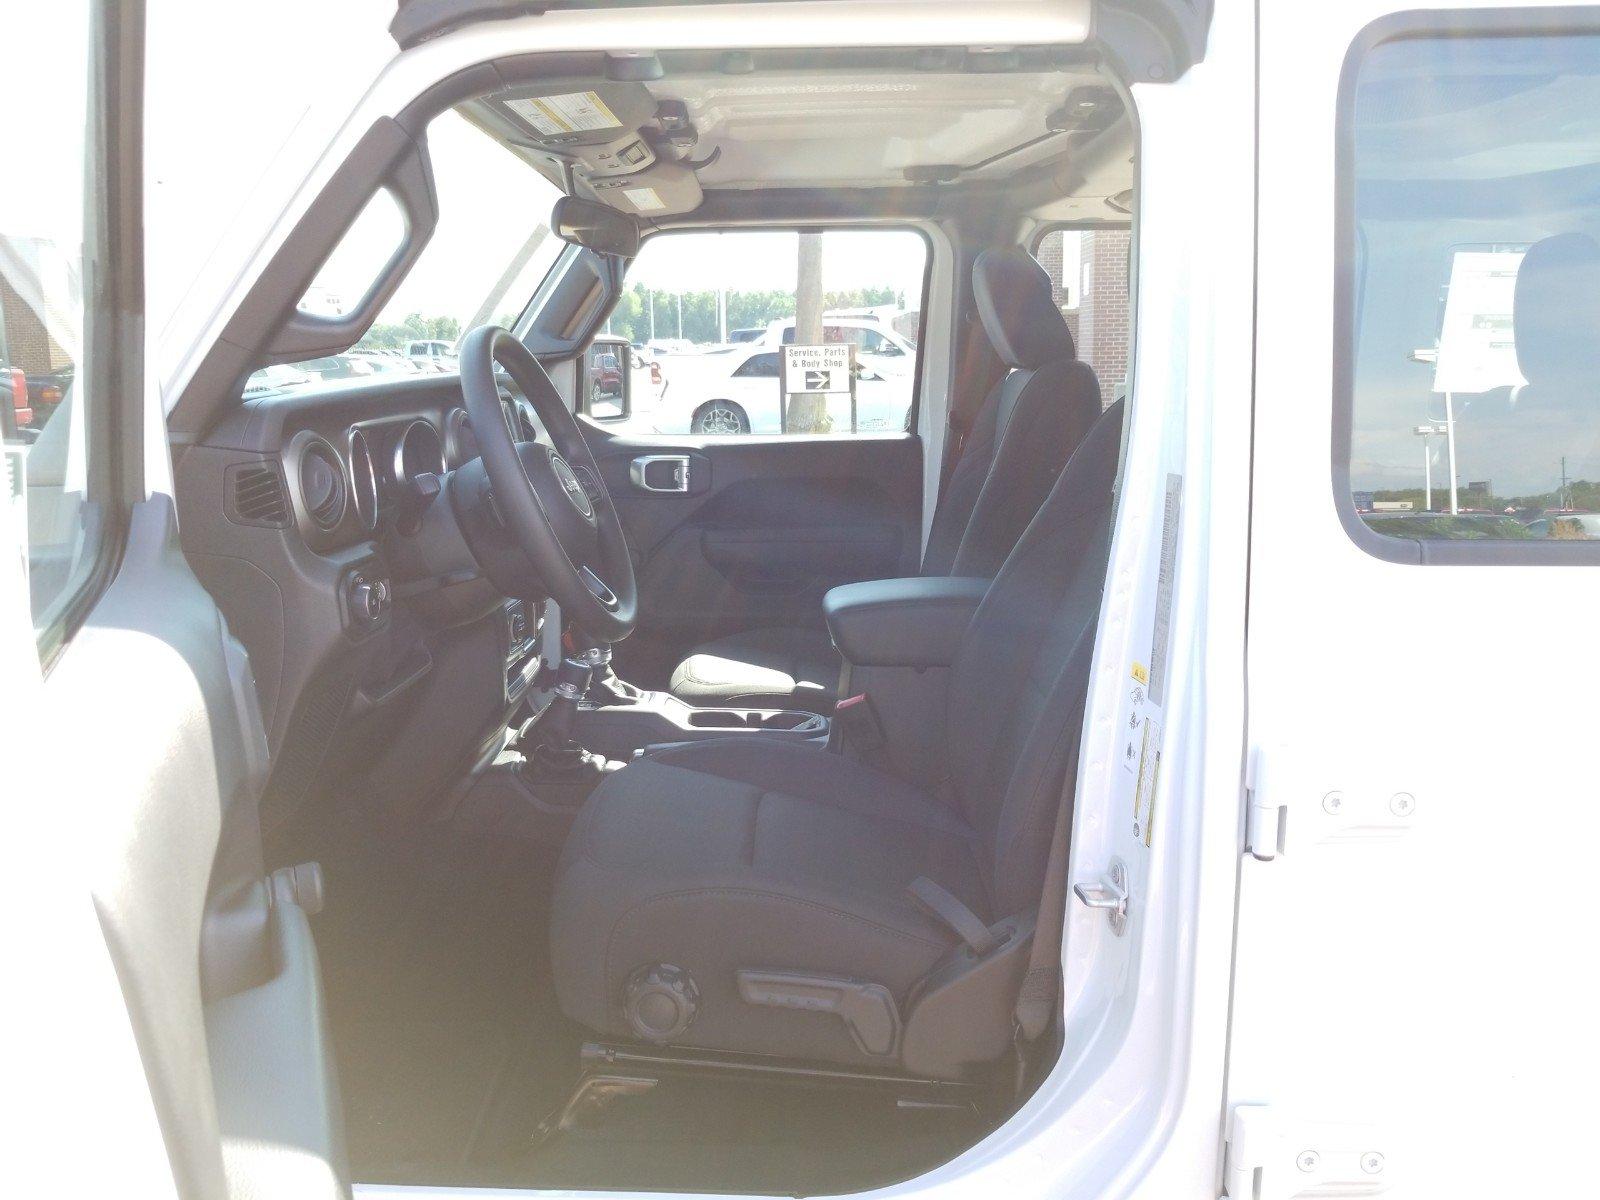 2018 Jeep Wrangler Unlimited Sport | Port Arthur TX | VIN#:  1C4HJXDN1JW224181 For Sale